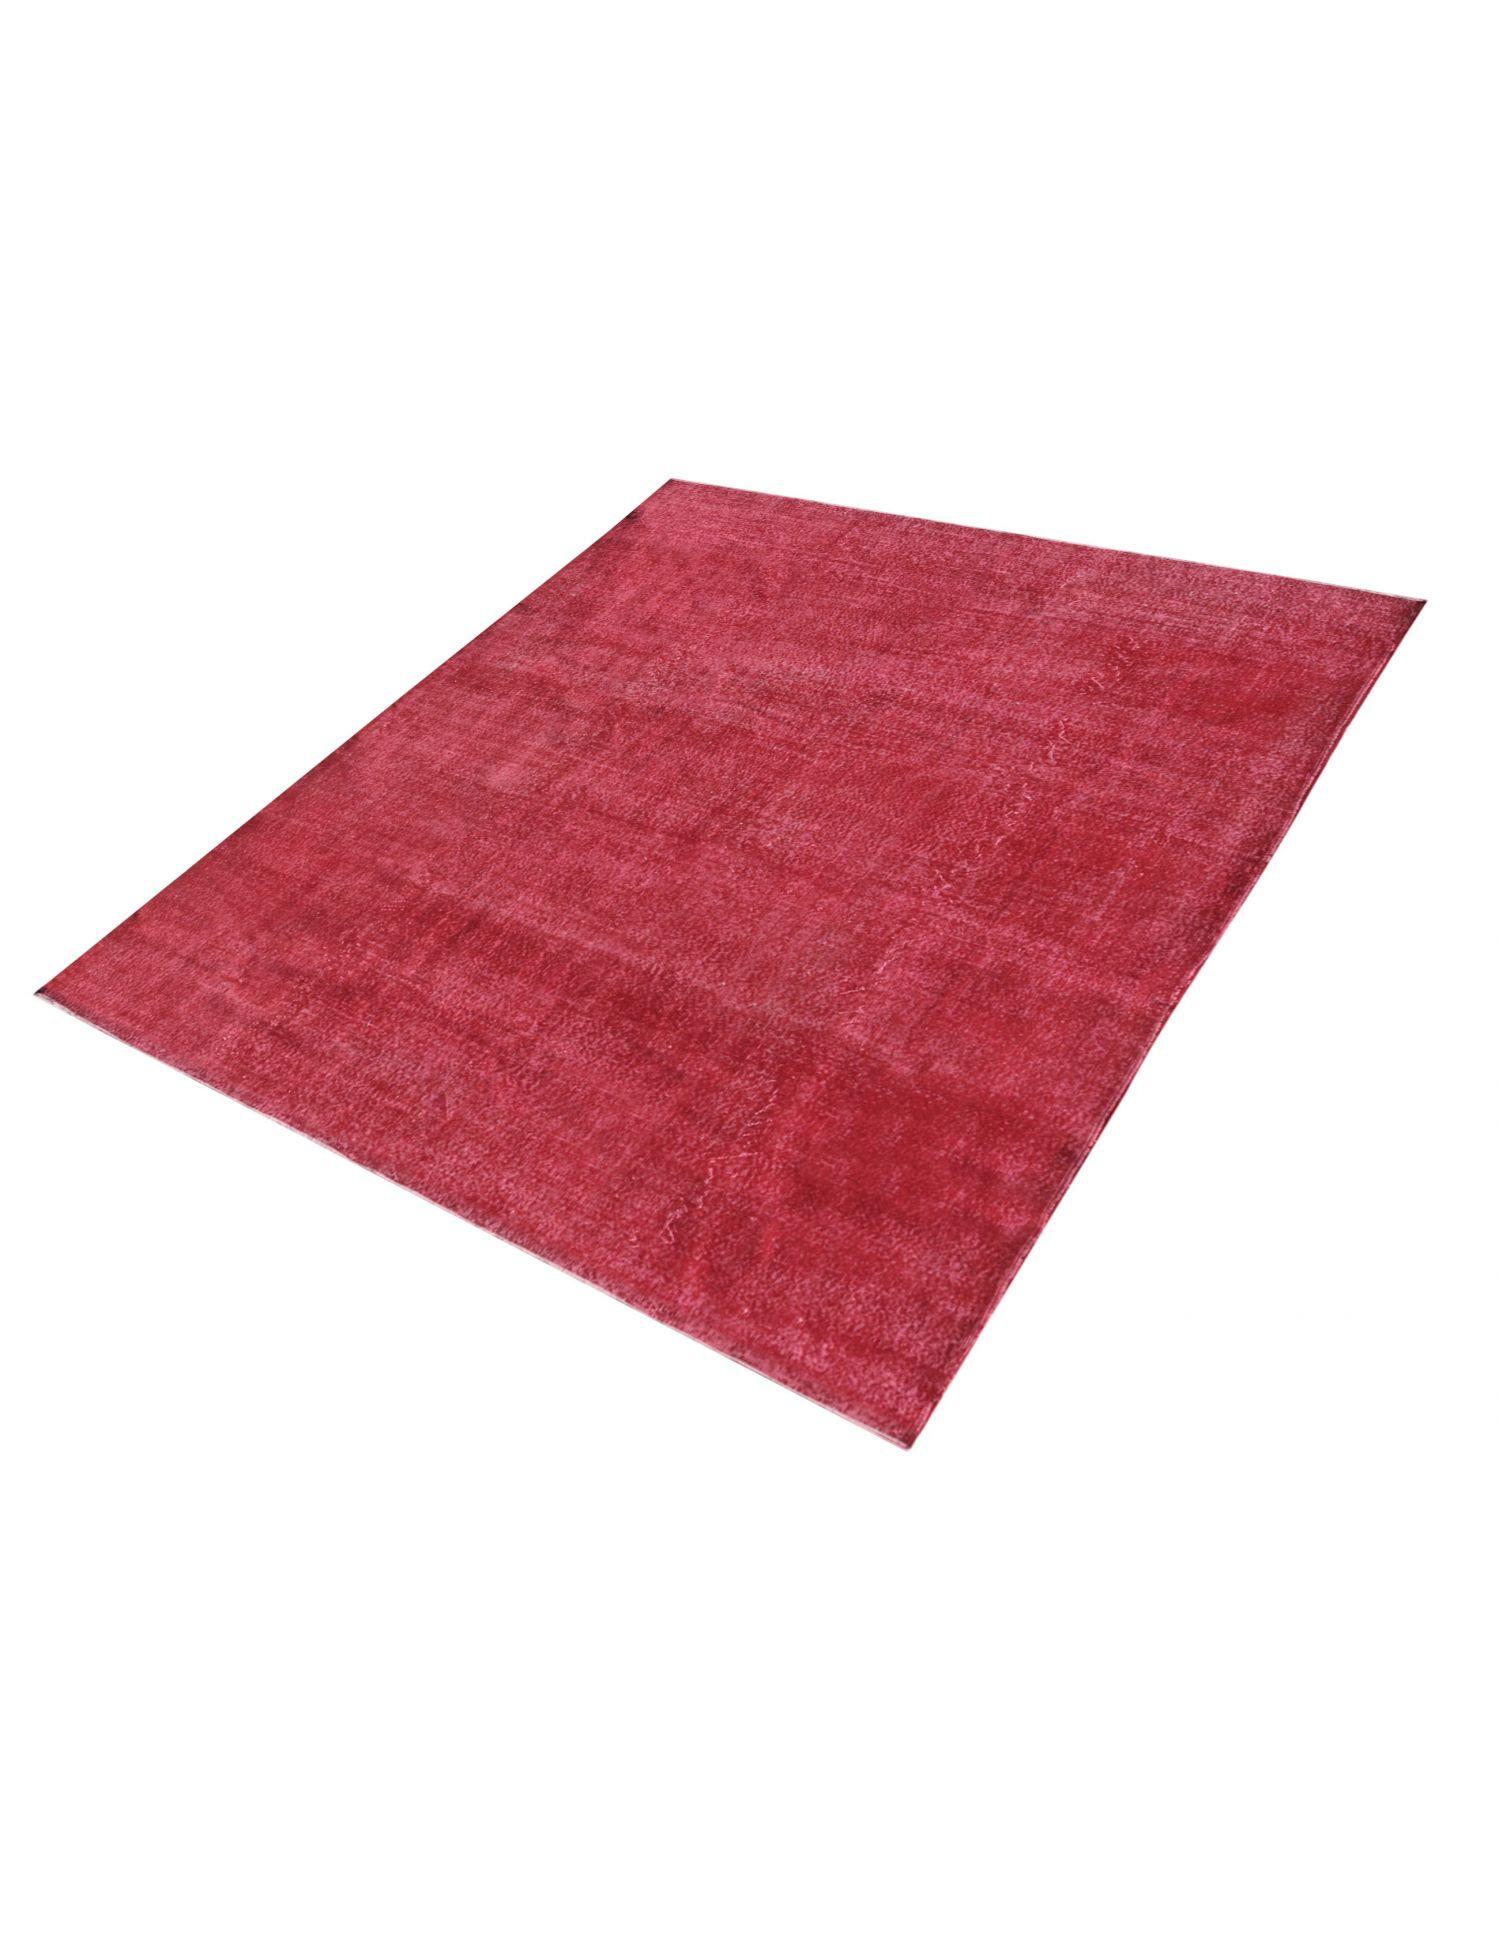 Tappeto Vintage  rosso <br/>248 x 248 cm